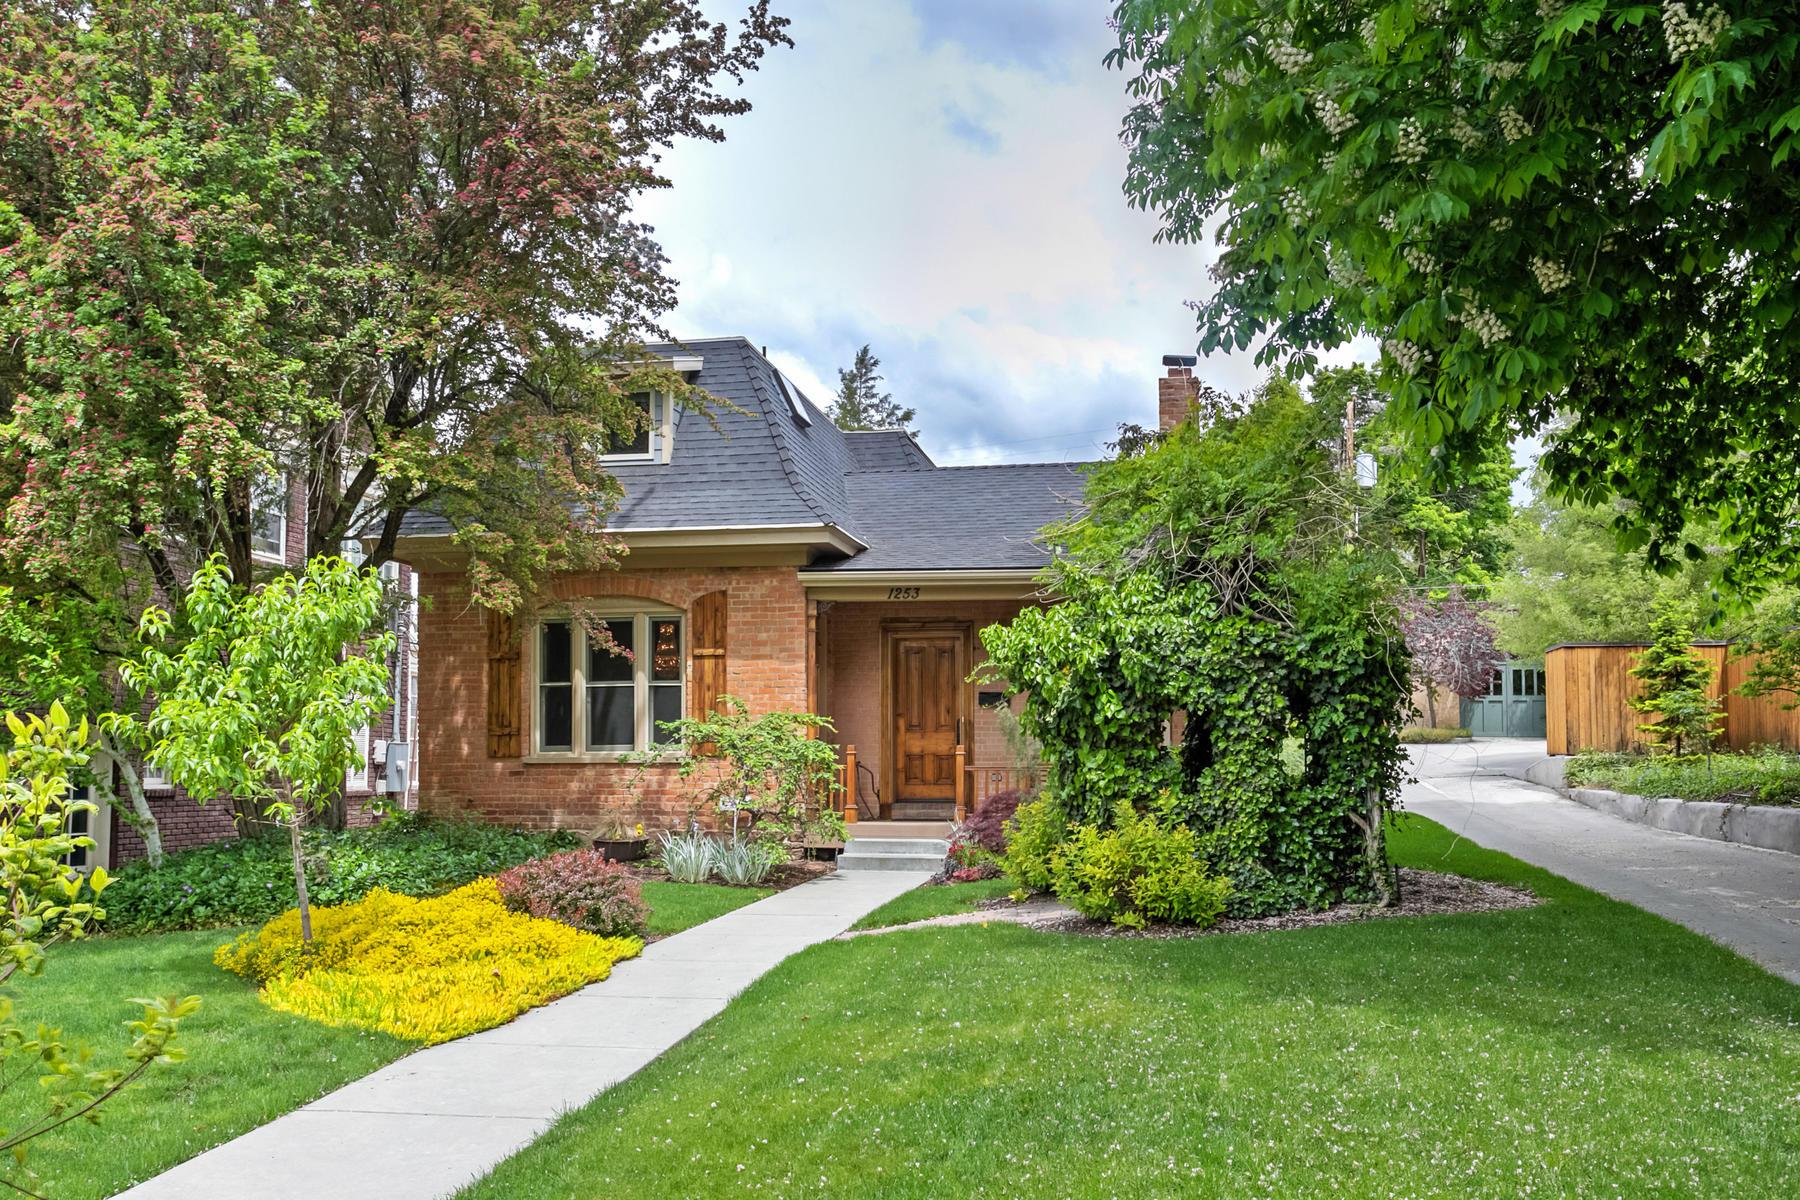 Villa per Vendita alle ore Remodeled Victorian Home in the University Neighborhood. 1253 East 100 South Salt Lake City, Utah, 84102 Stati Uniti